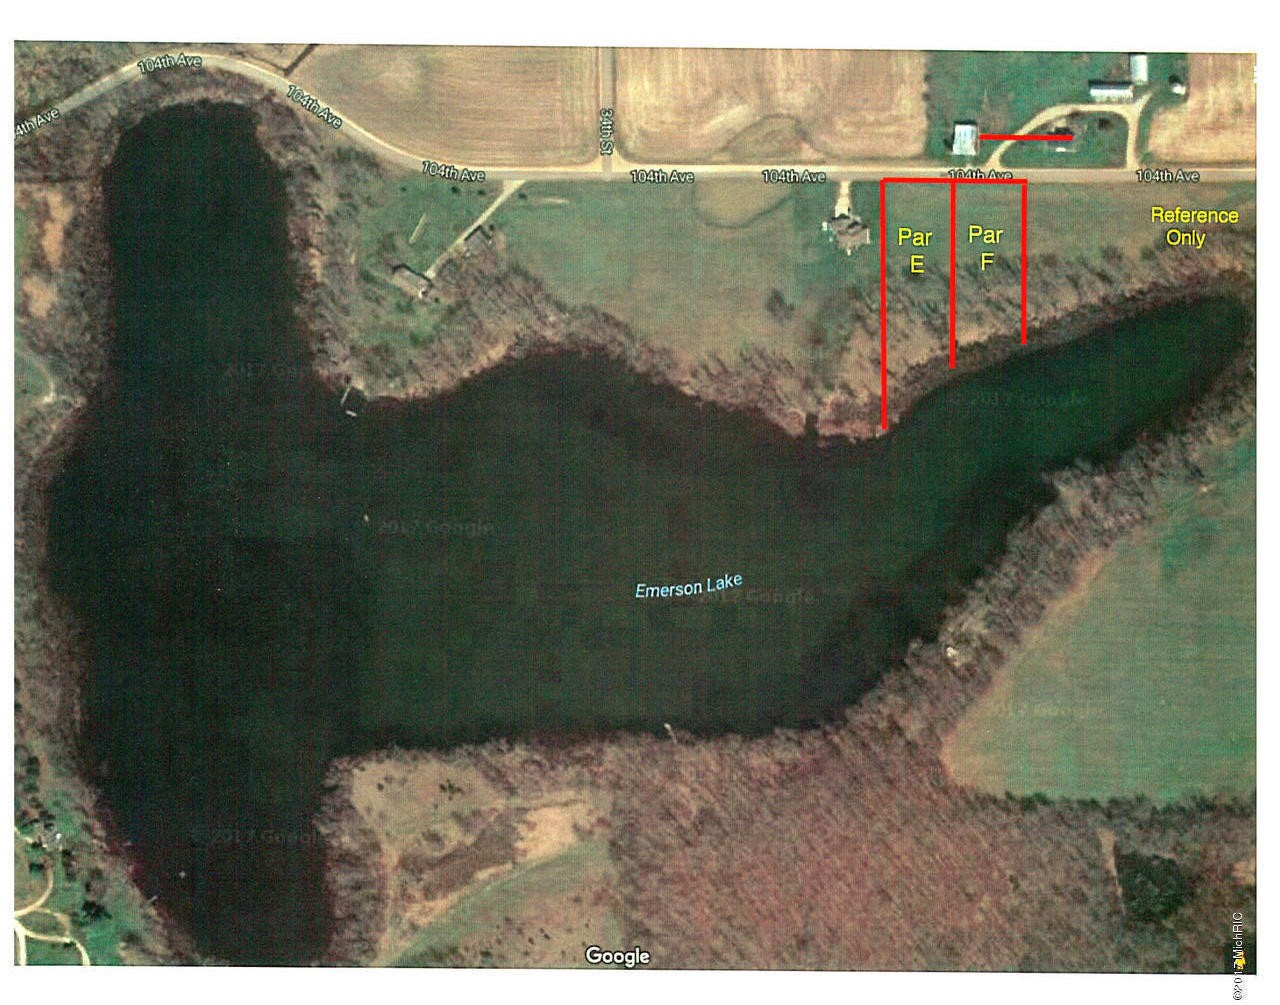 Emerson Lake Sparkling Waters Lot E Property Photograph